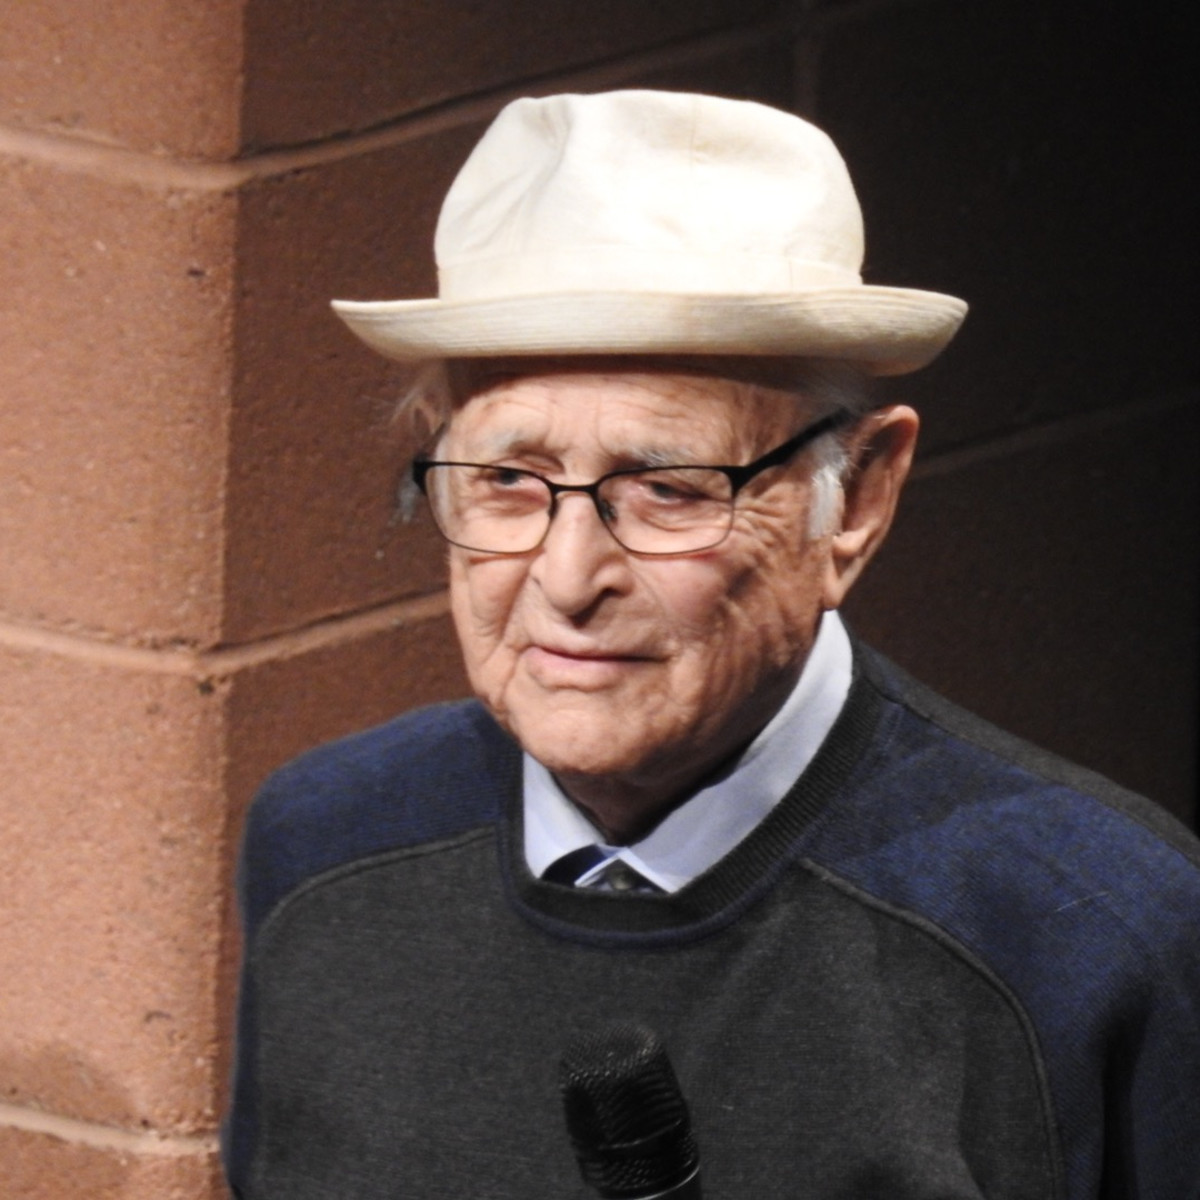 Norman Lear Sundance Film Festival